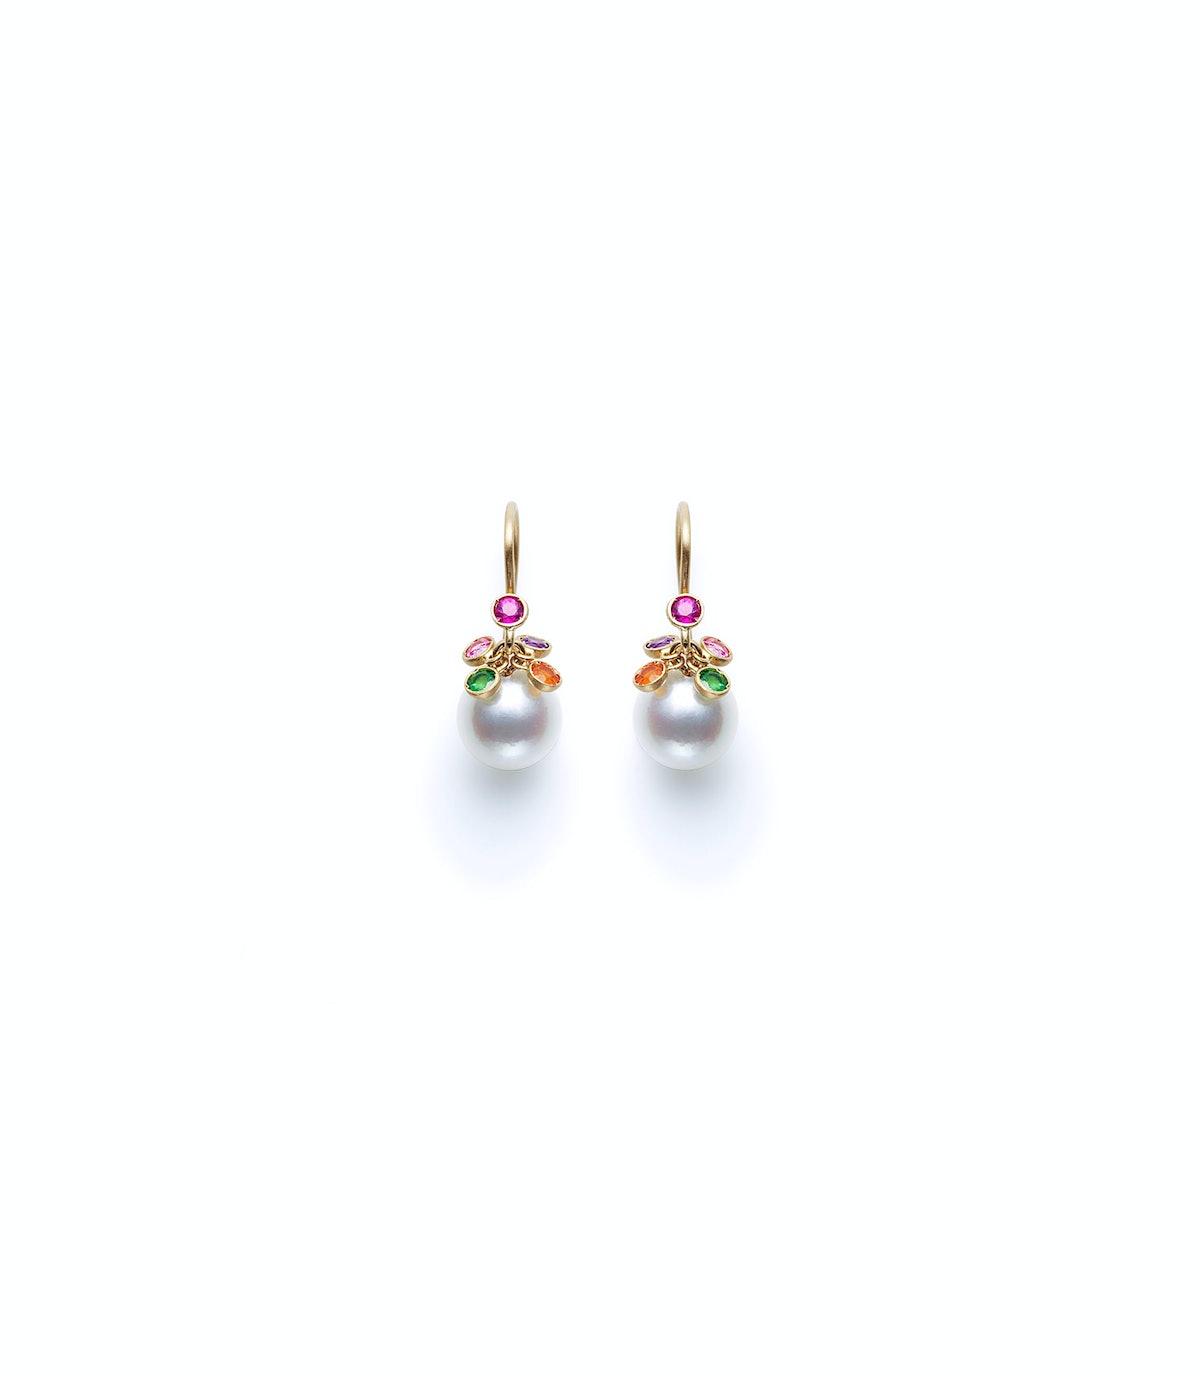 acss-marie-helene-de-talliac-pearls-02